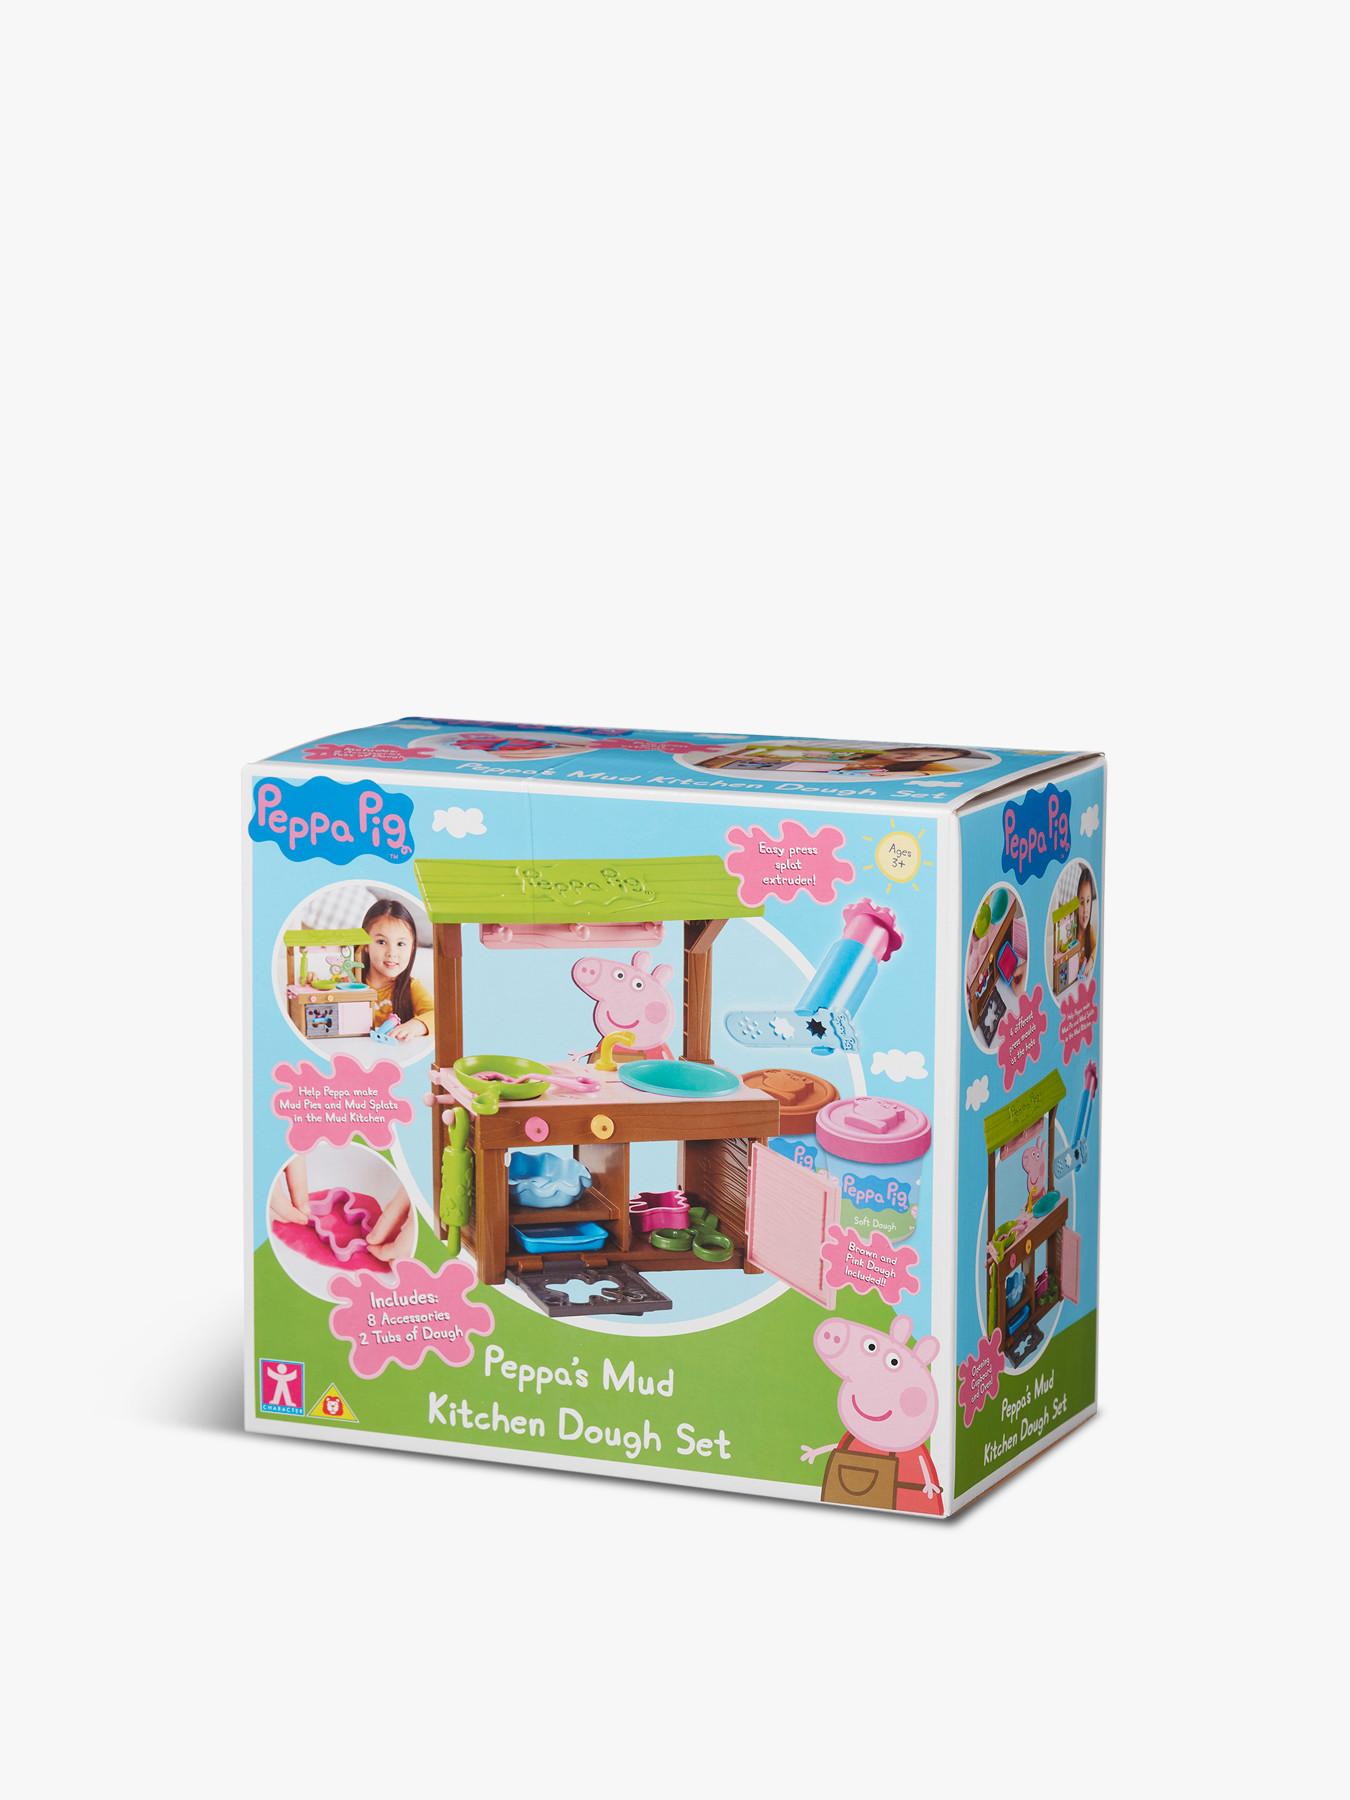 Peppa Pig Peppa S Mud Kitchen Dough Set Preschool Toys Fenwick